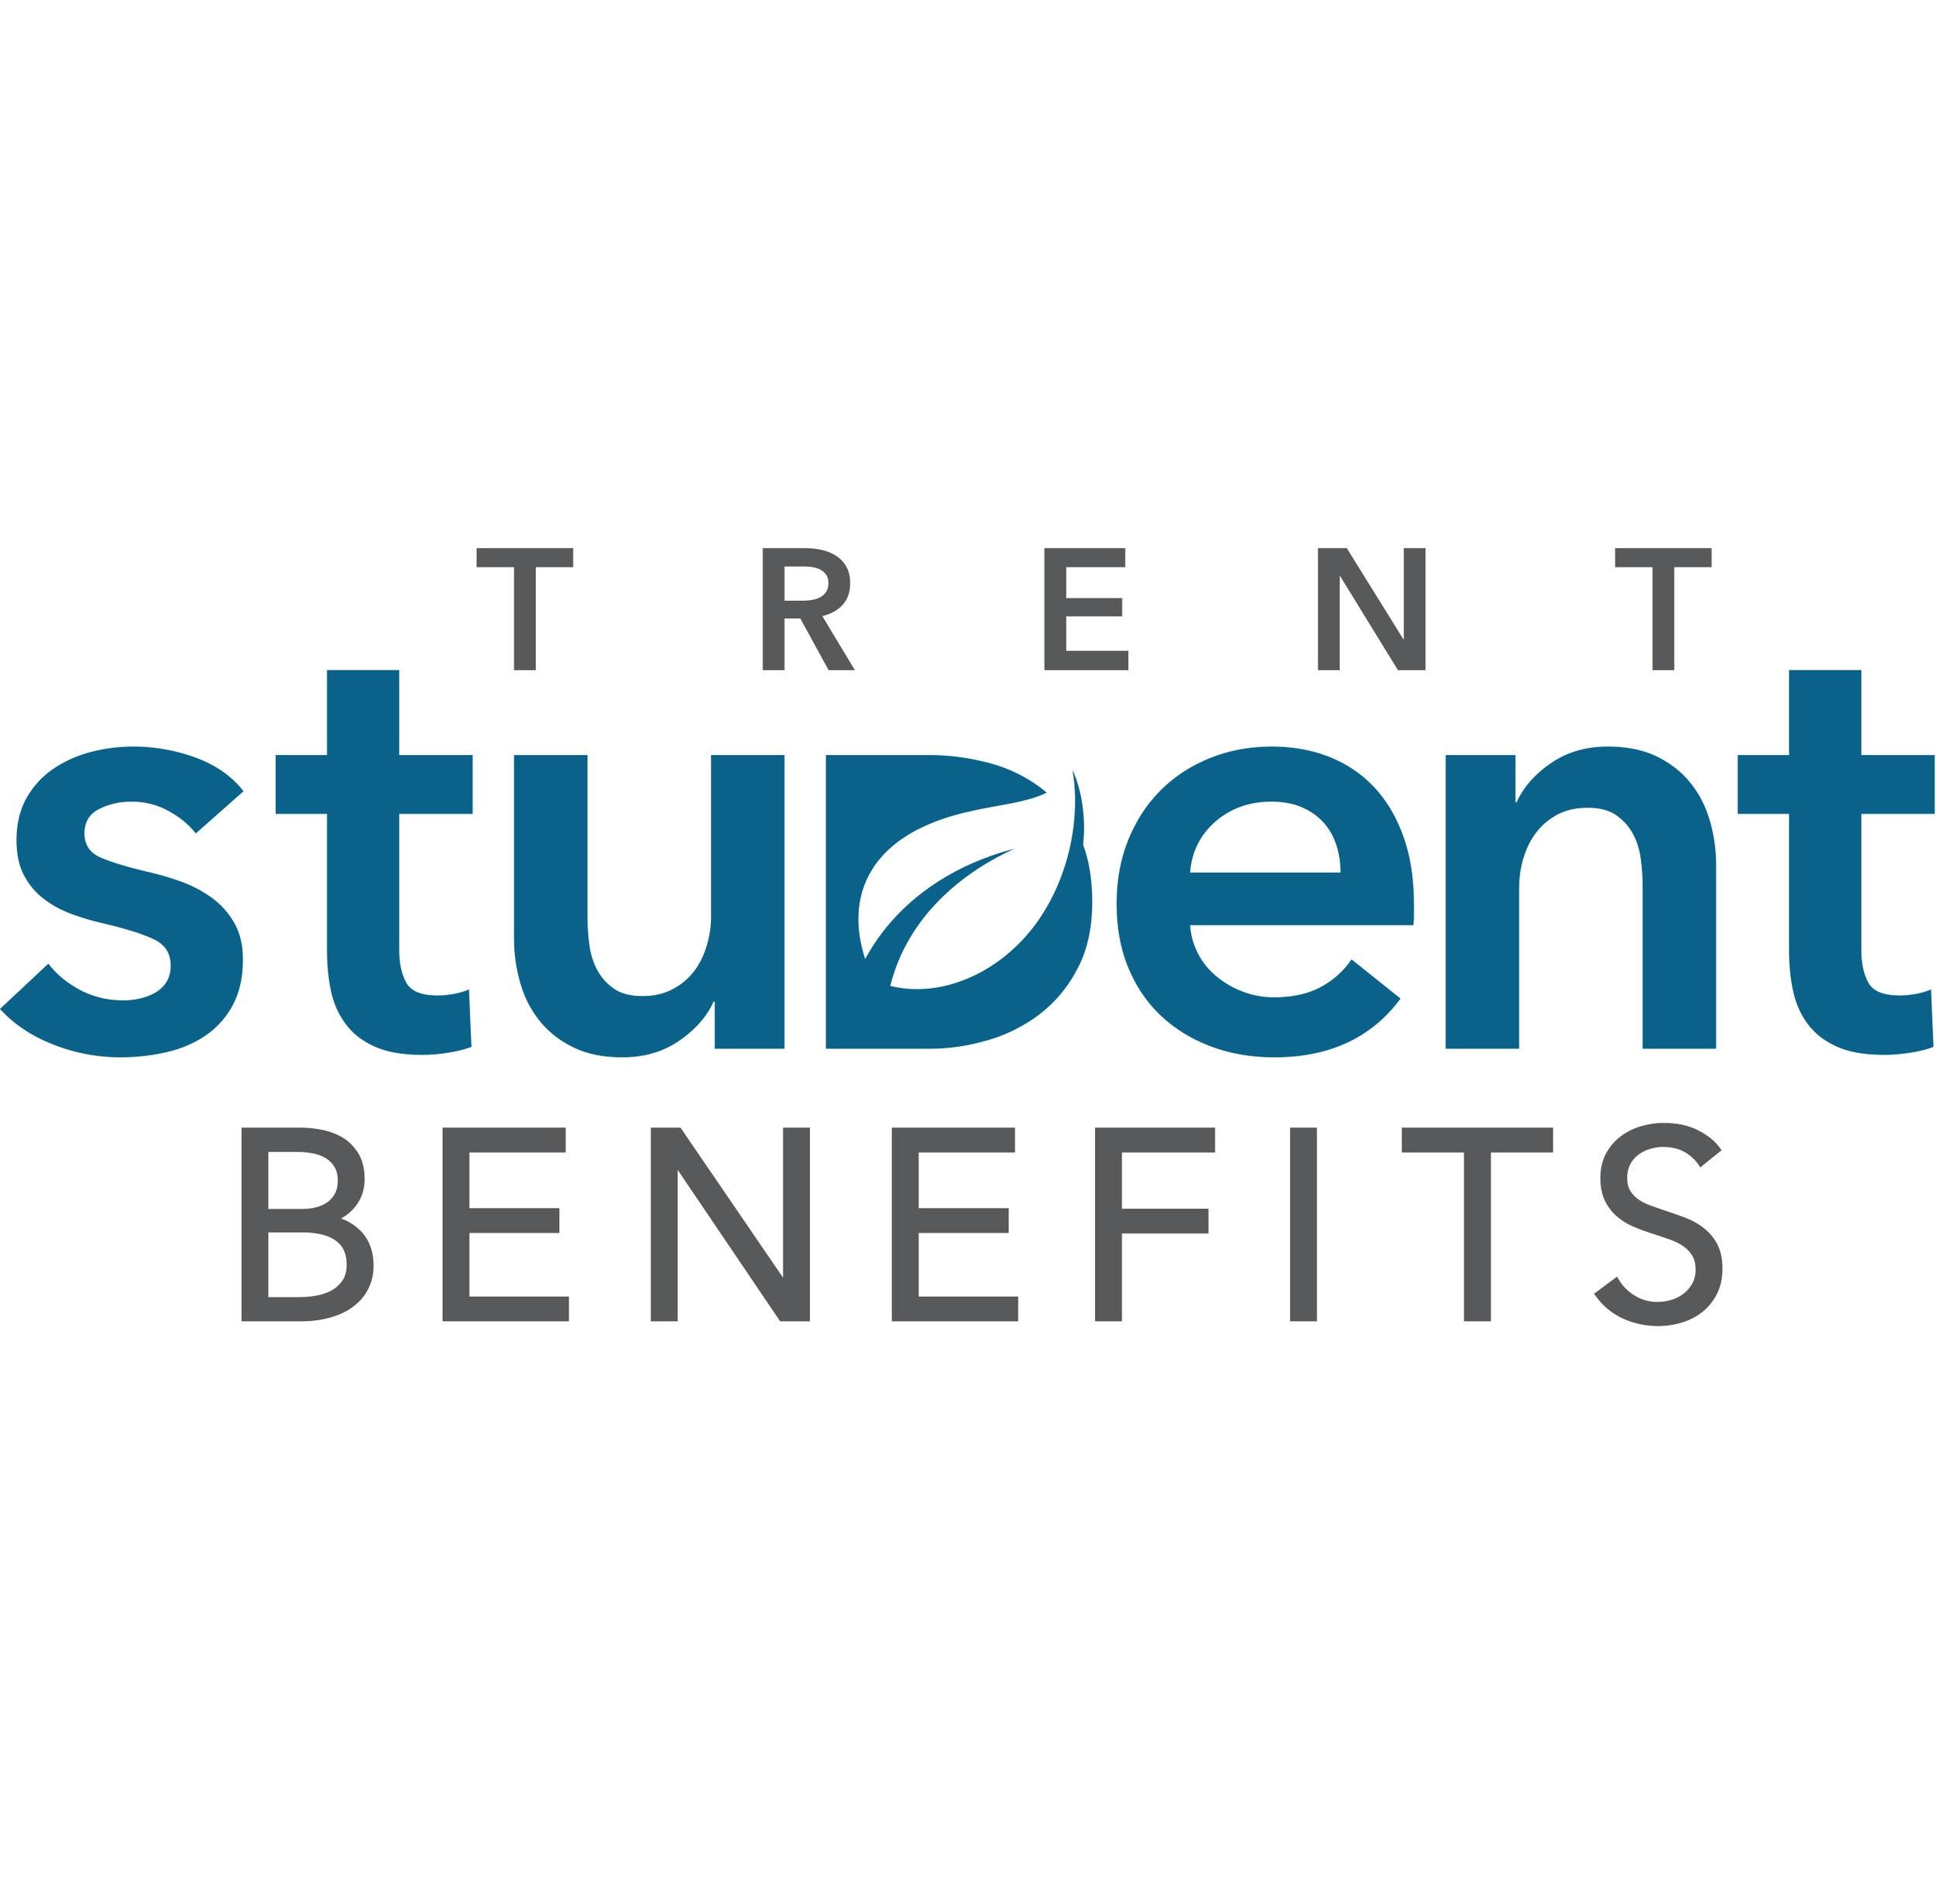 Trent_Student_Benefits_Logo-1.jpg